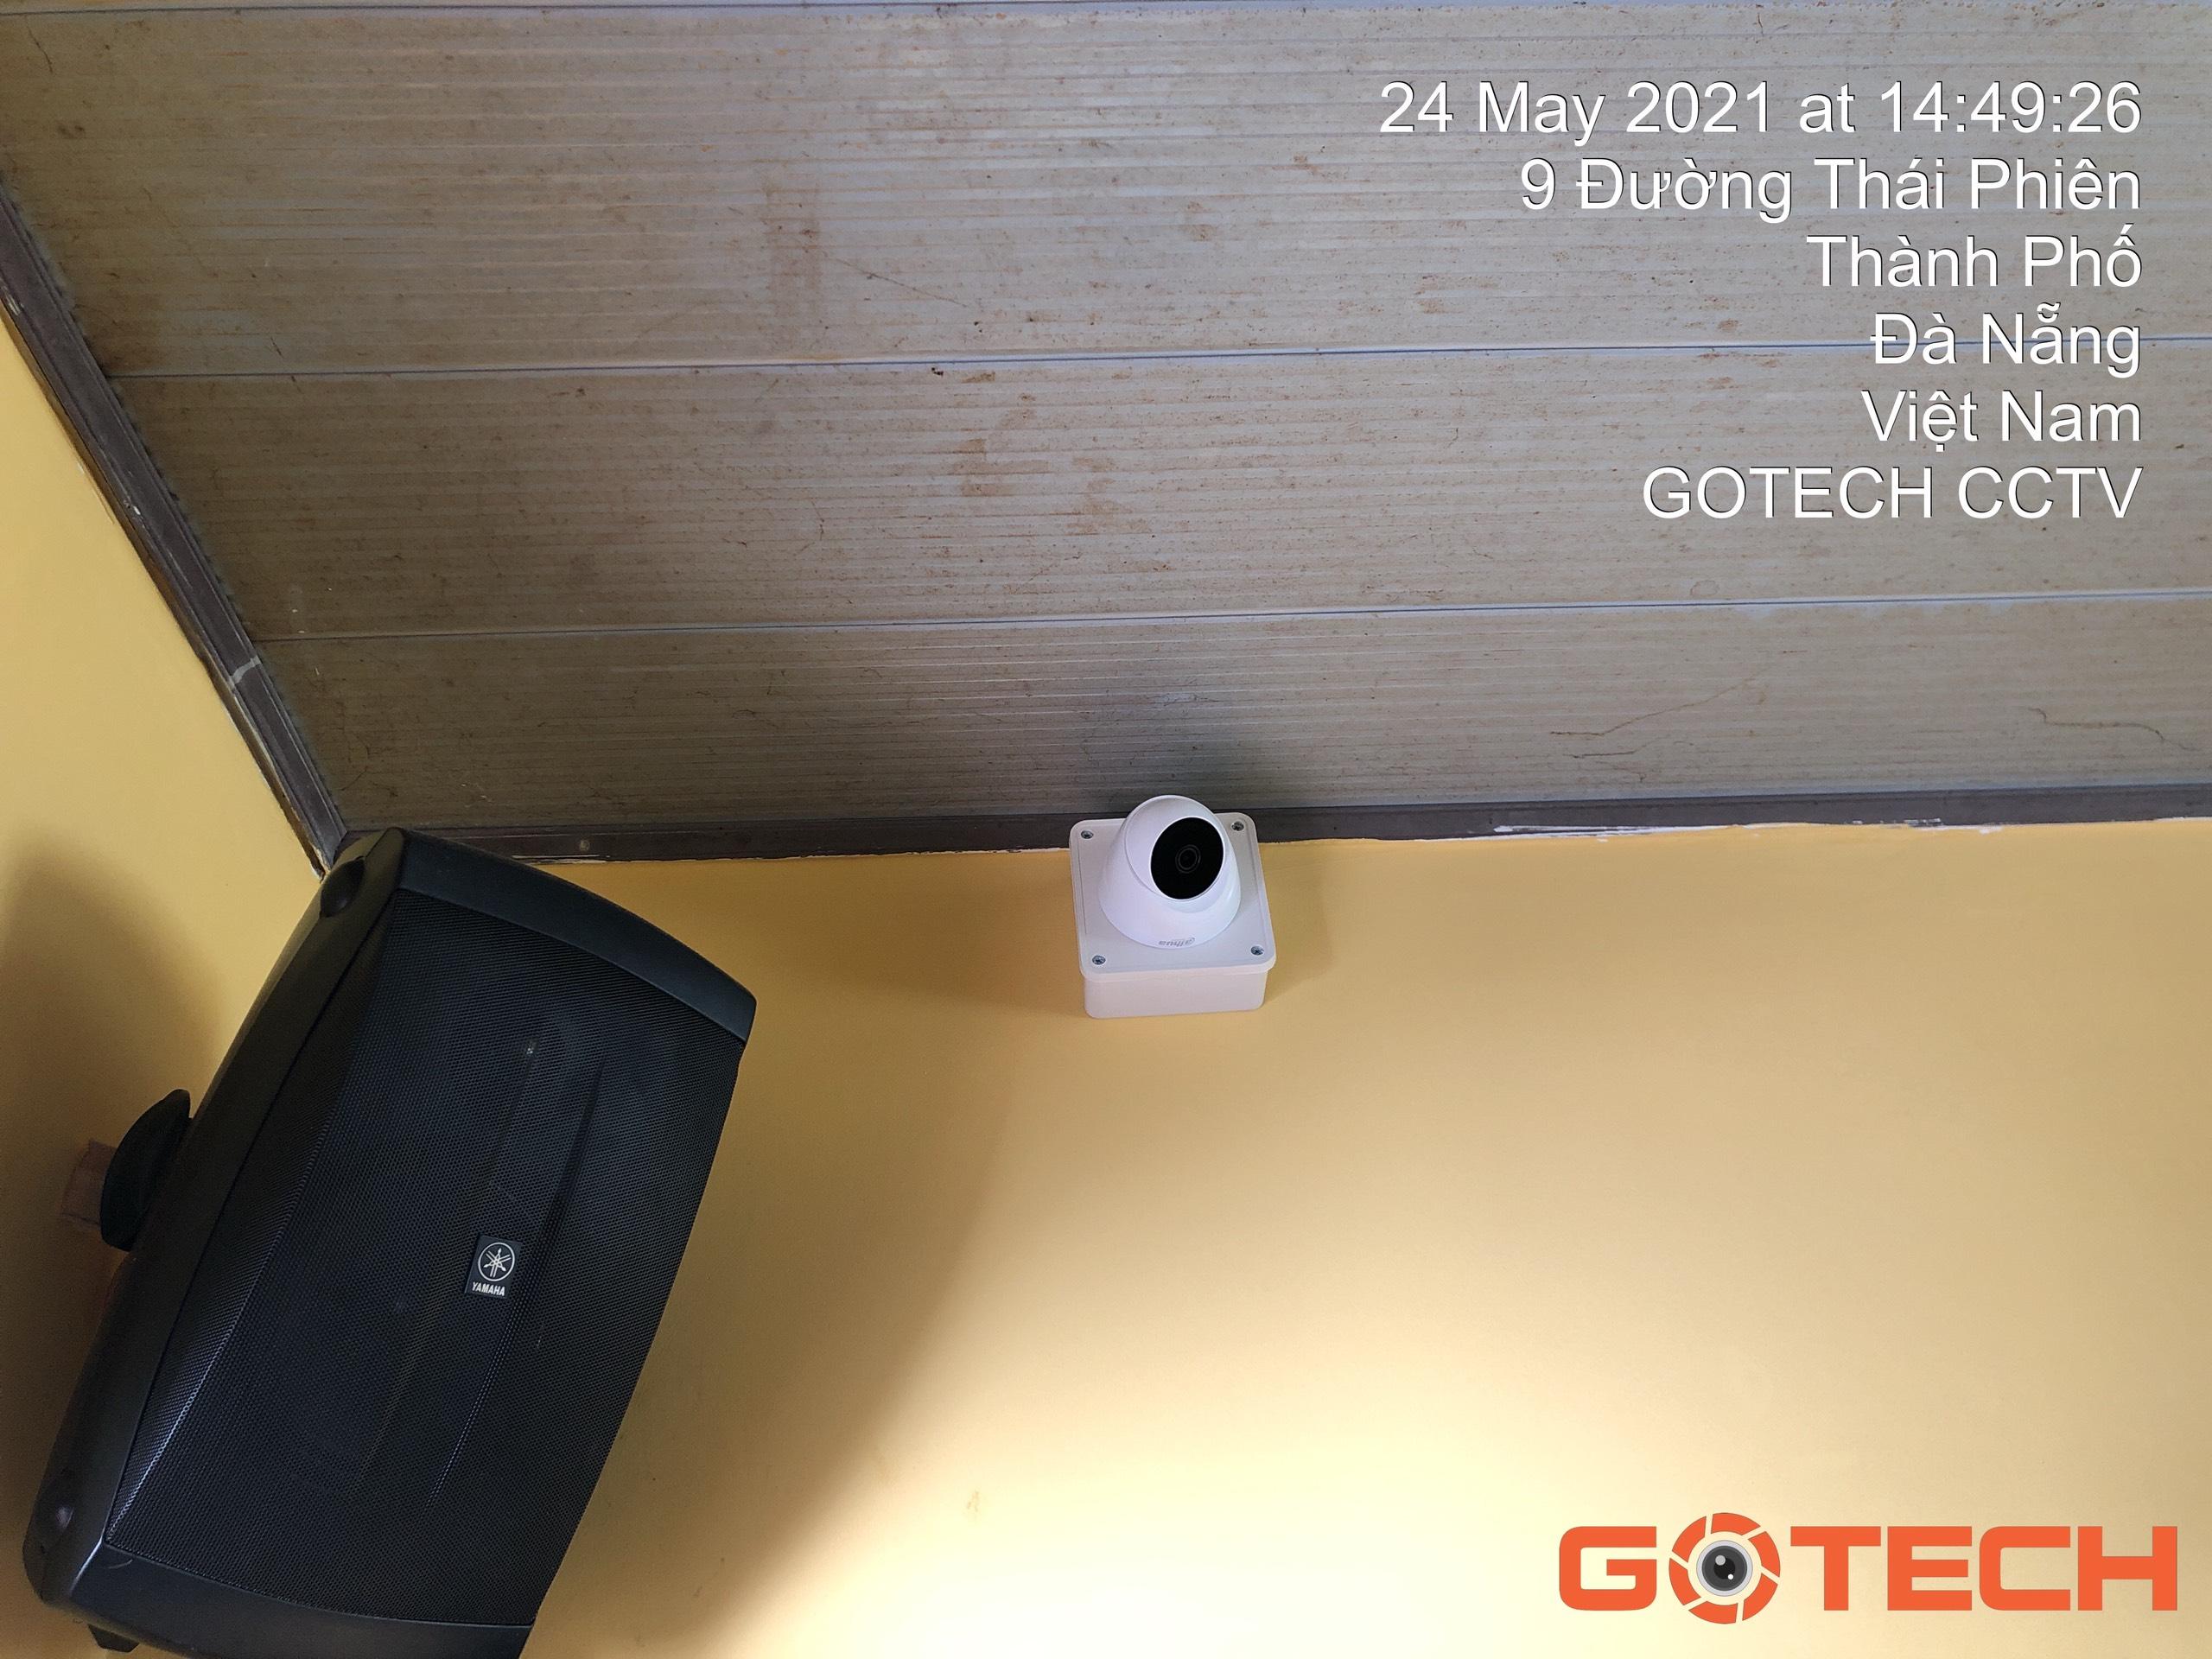 lap-dat-camera-tai-da-nang-tie-tag-coffee-18-thai-phien-5